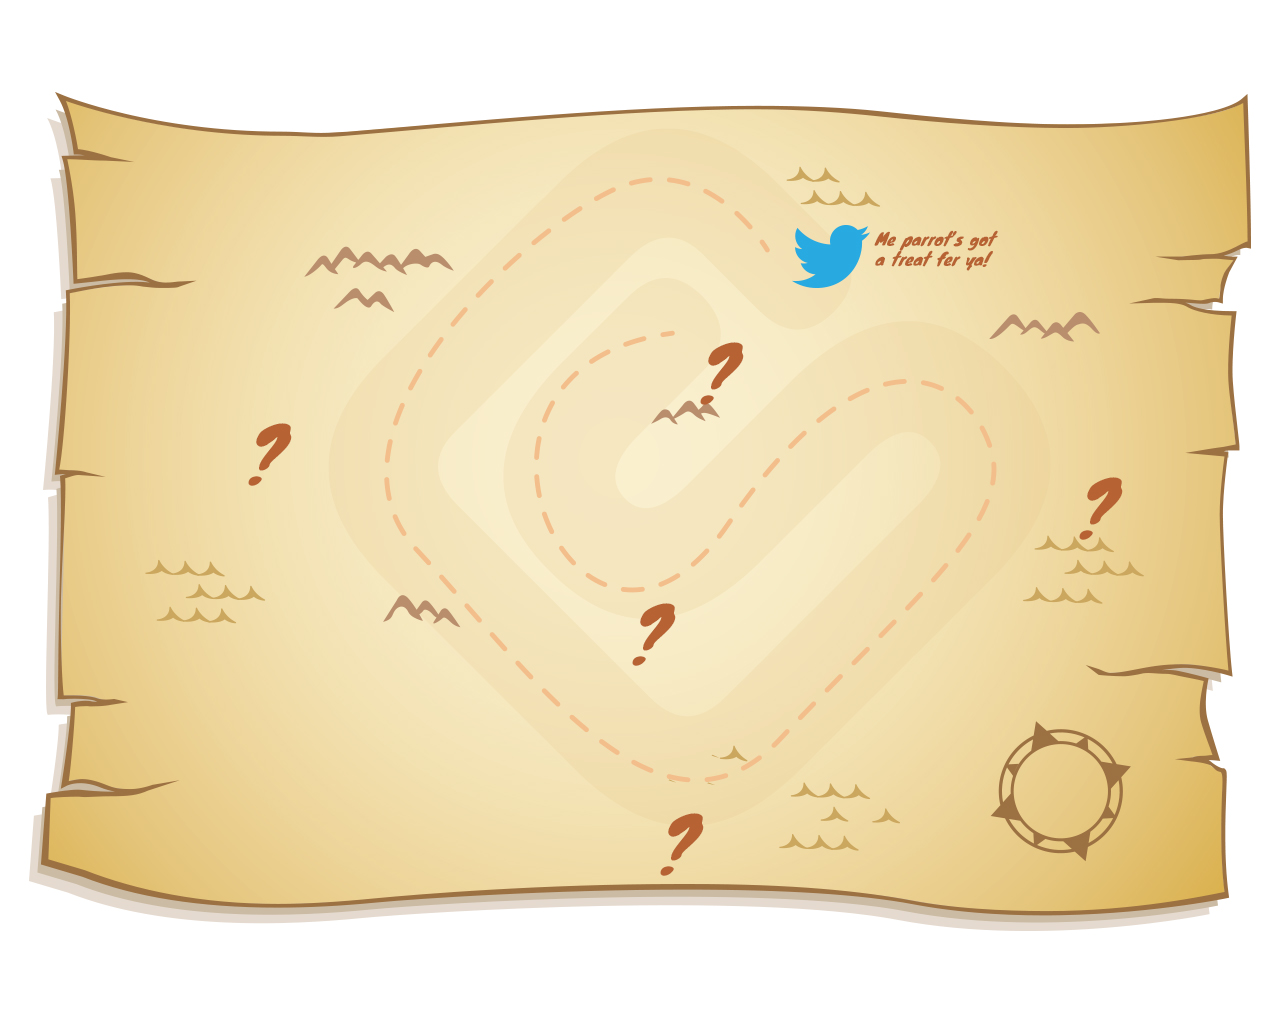 6 Best Images of Printable Treasure Hunt Map - Printable Kids Treasure Map, Blank Treasure Map ...